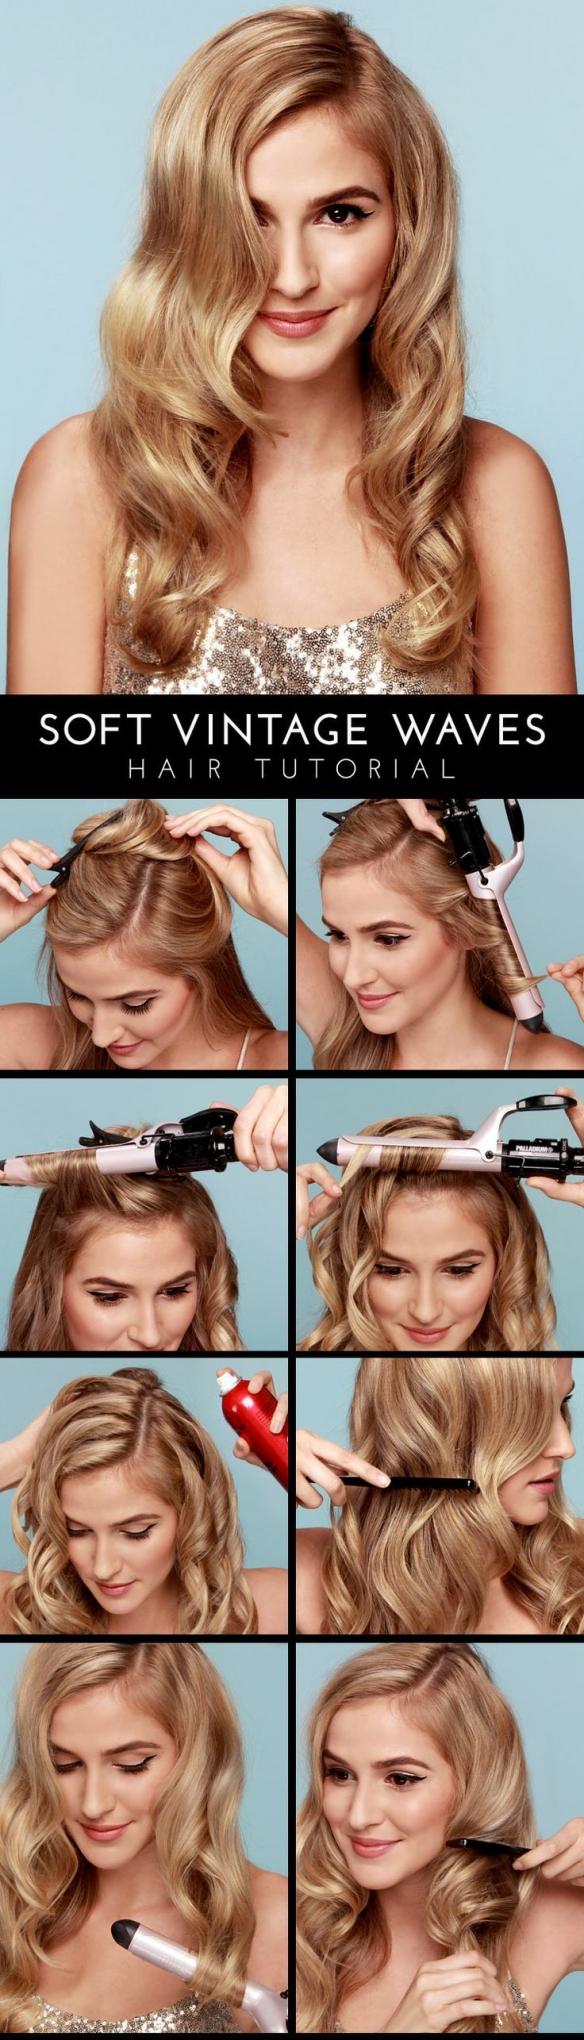 Kako napraviti retro frizuru - Frizure.hr - Tražite